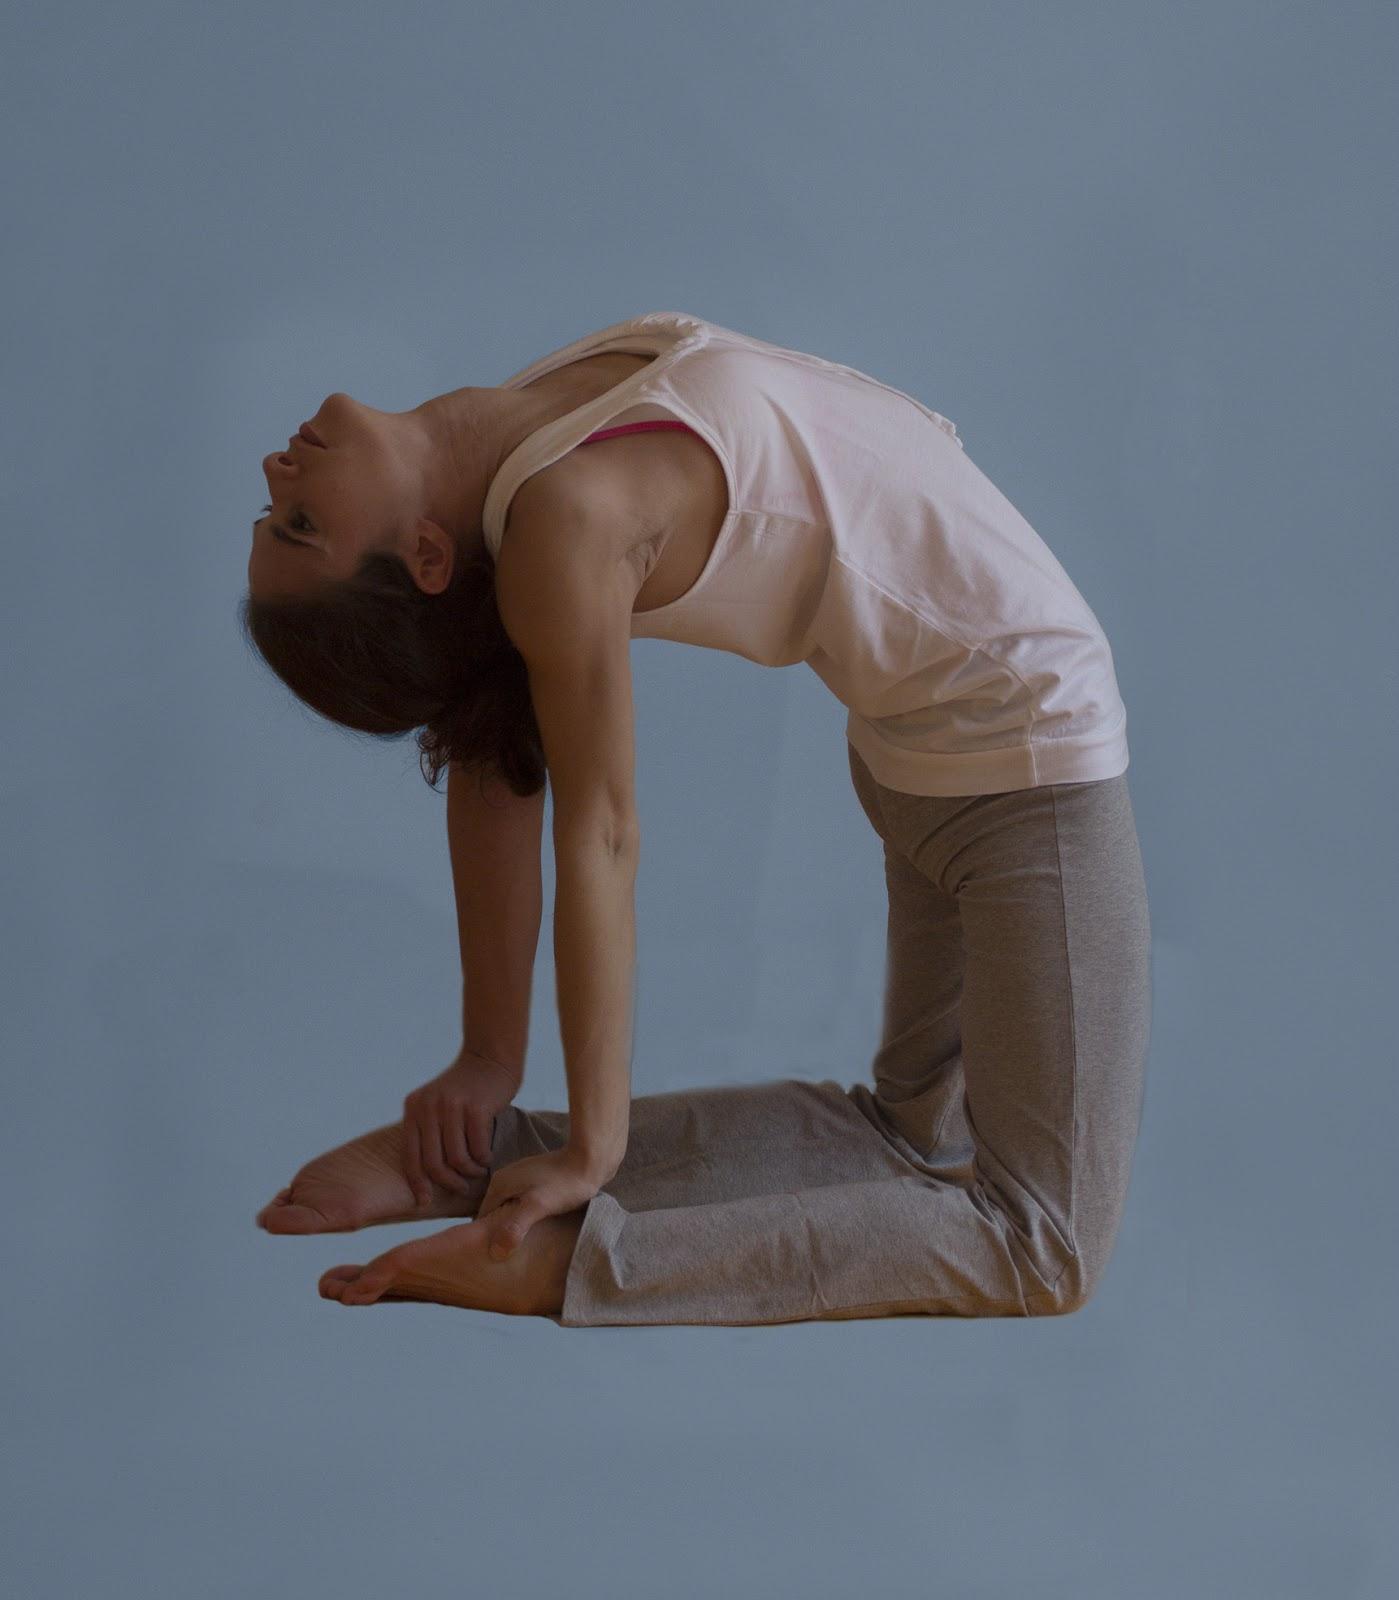 yoga arturo soria